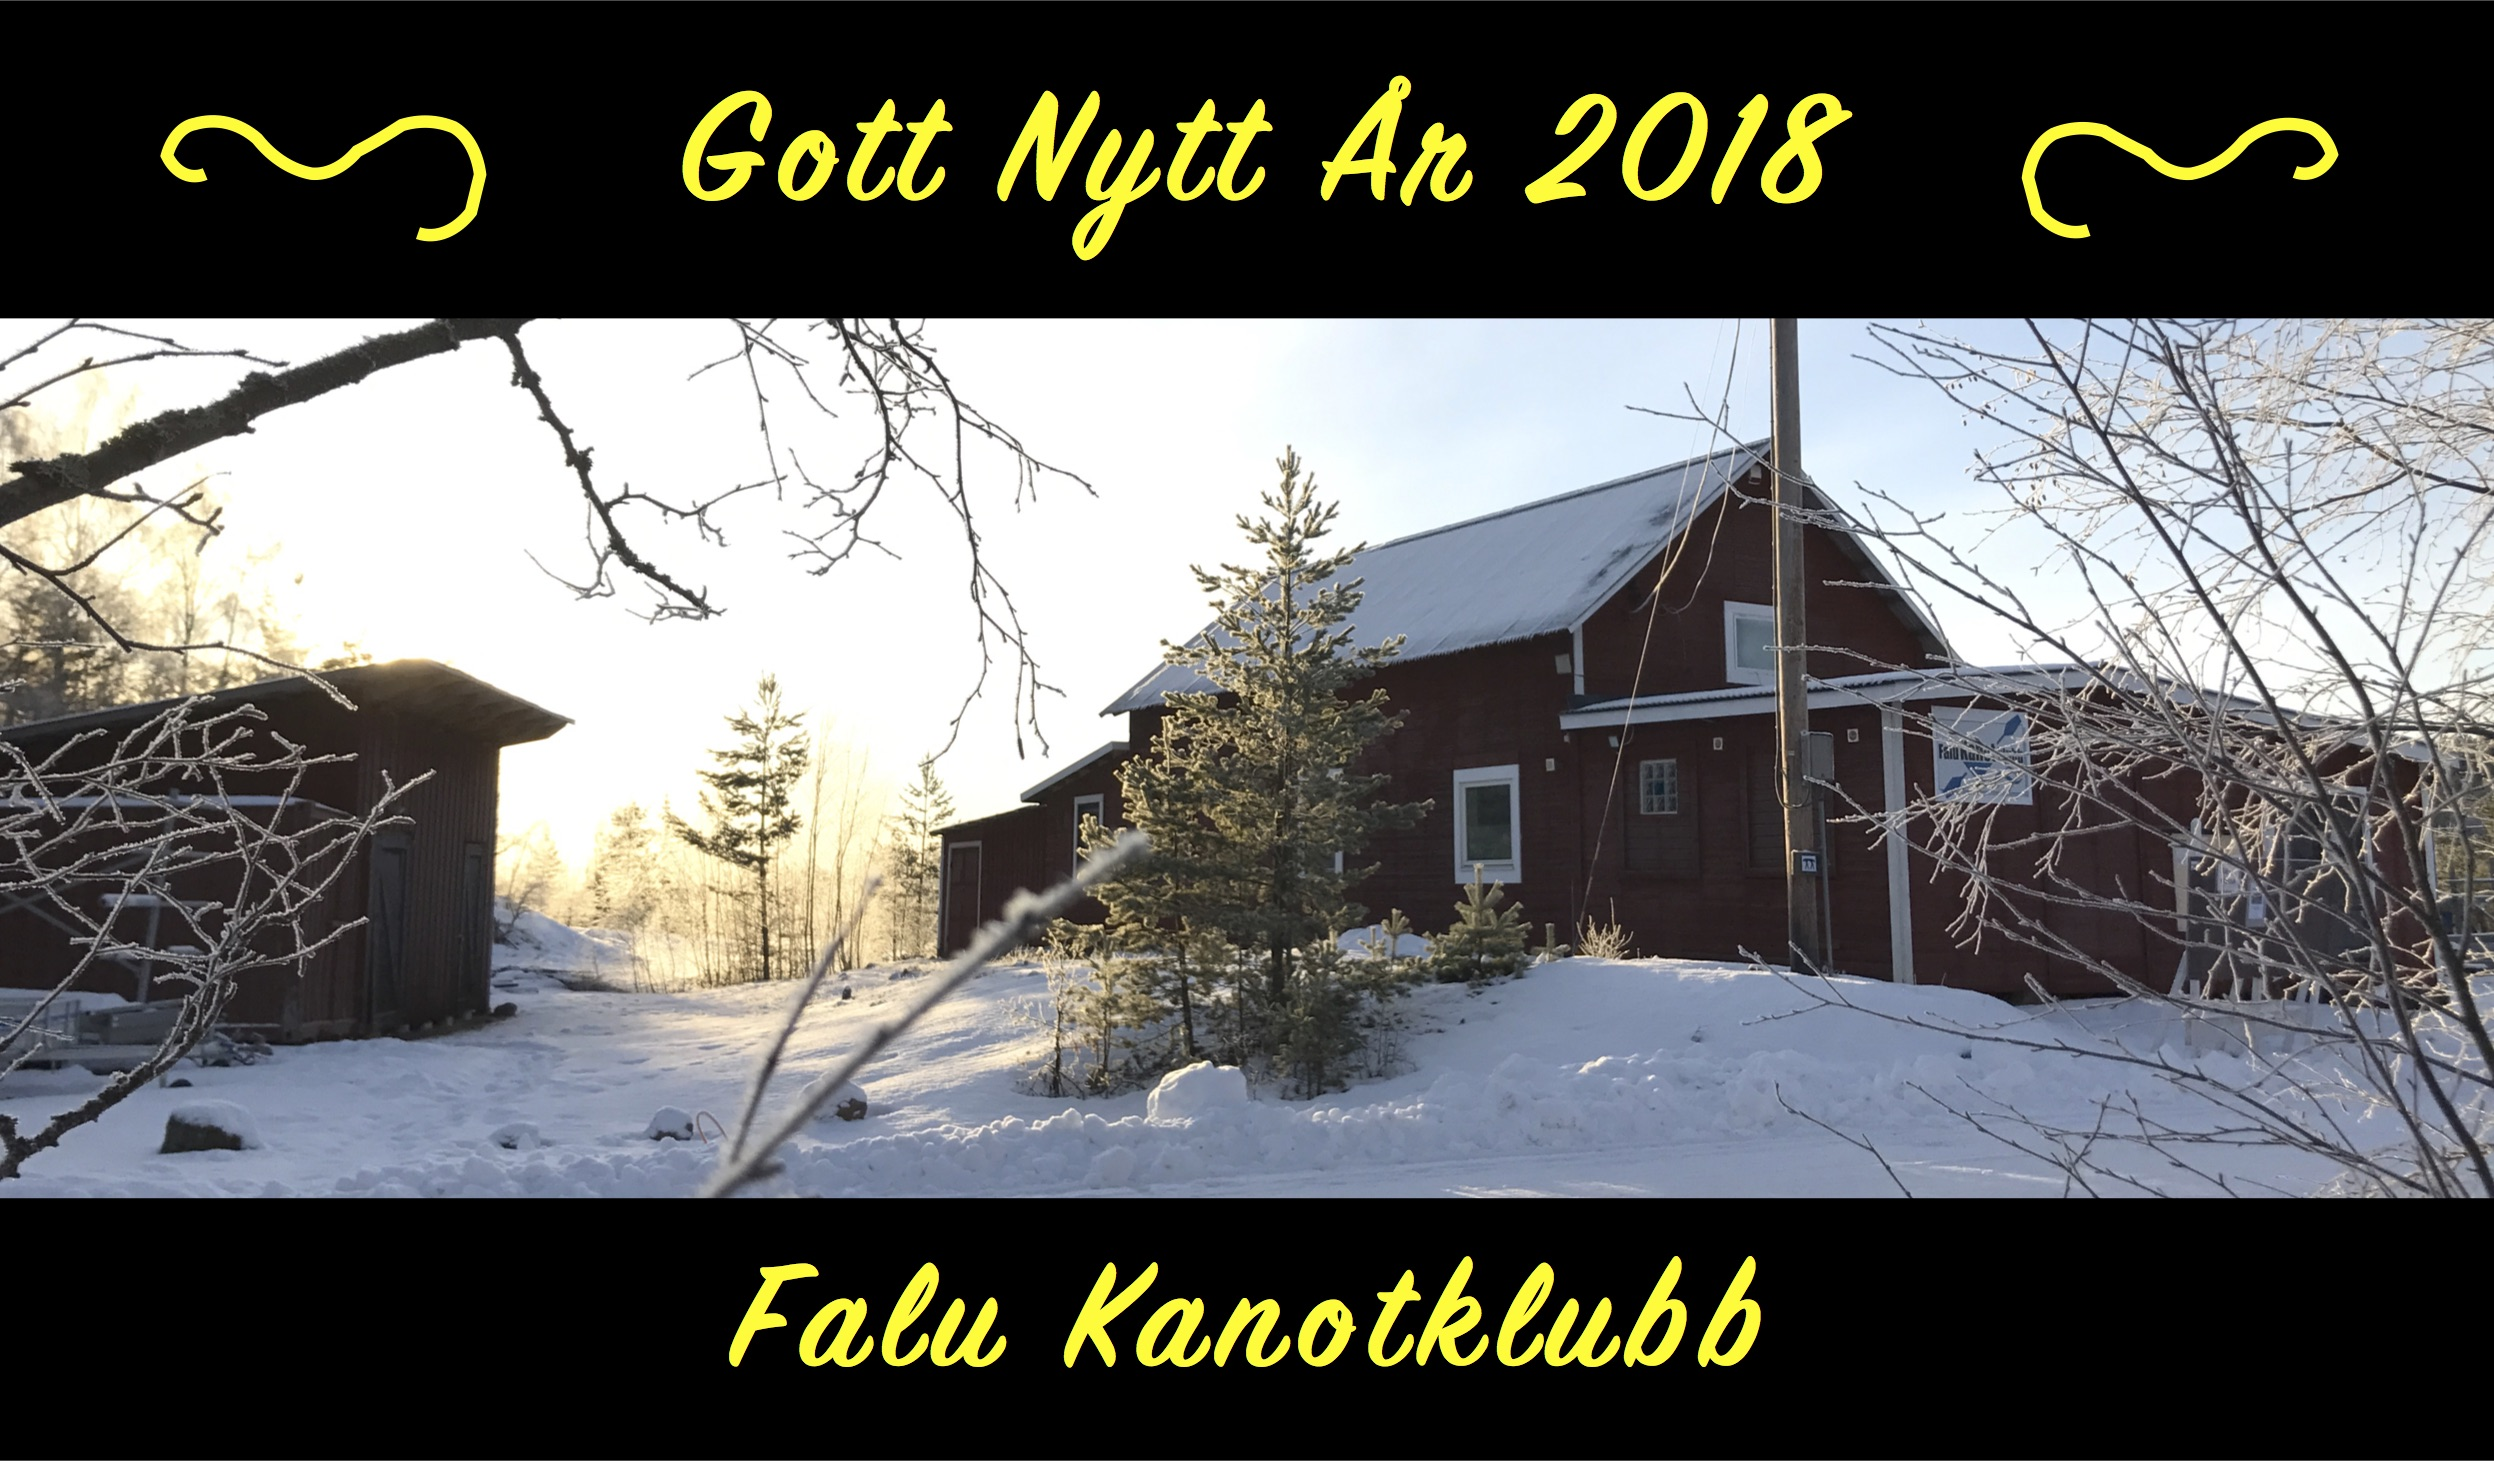 gott nytt år 2018